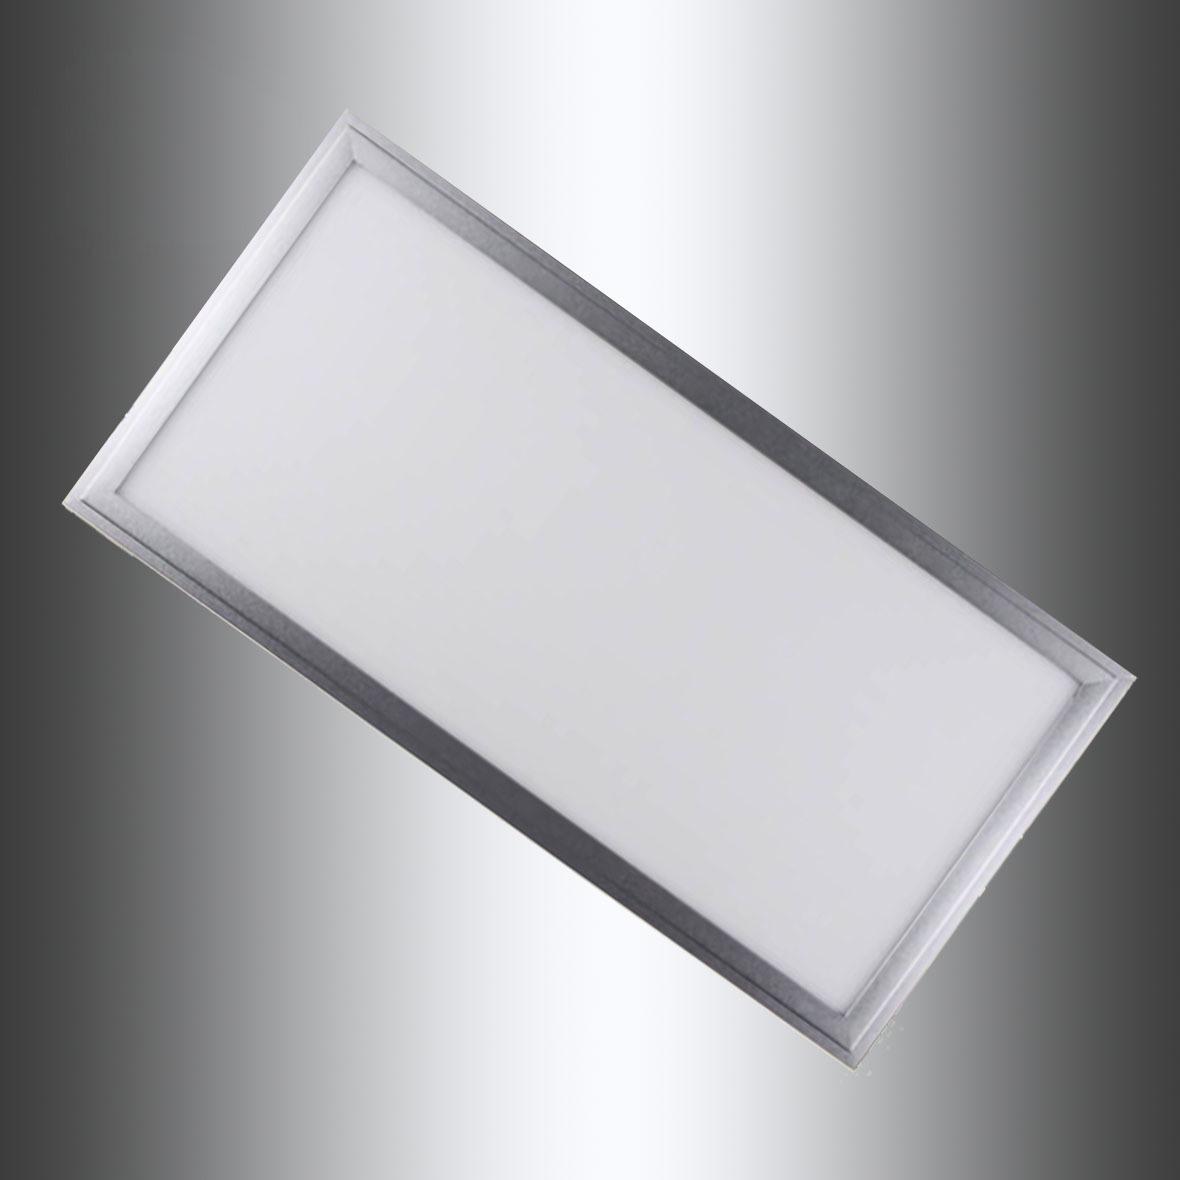 Energy Saving Aluminum Rectangular LED Panel Light